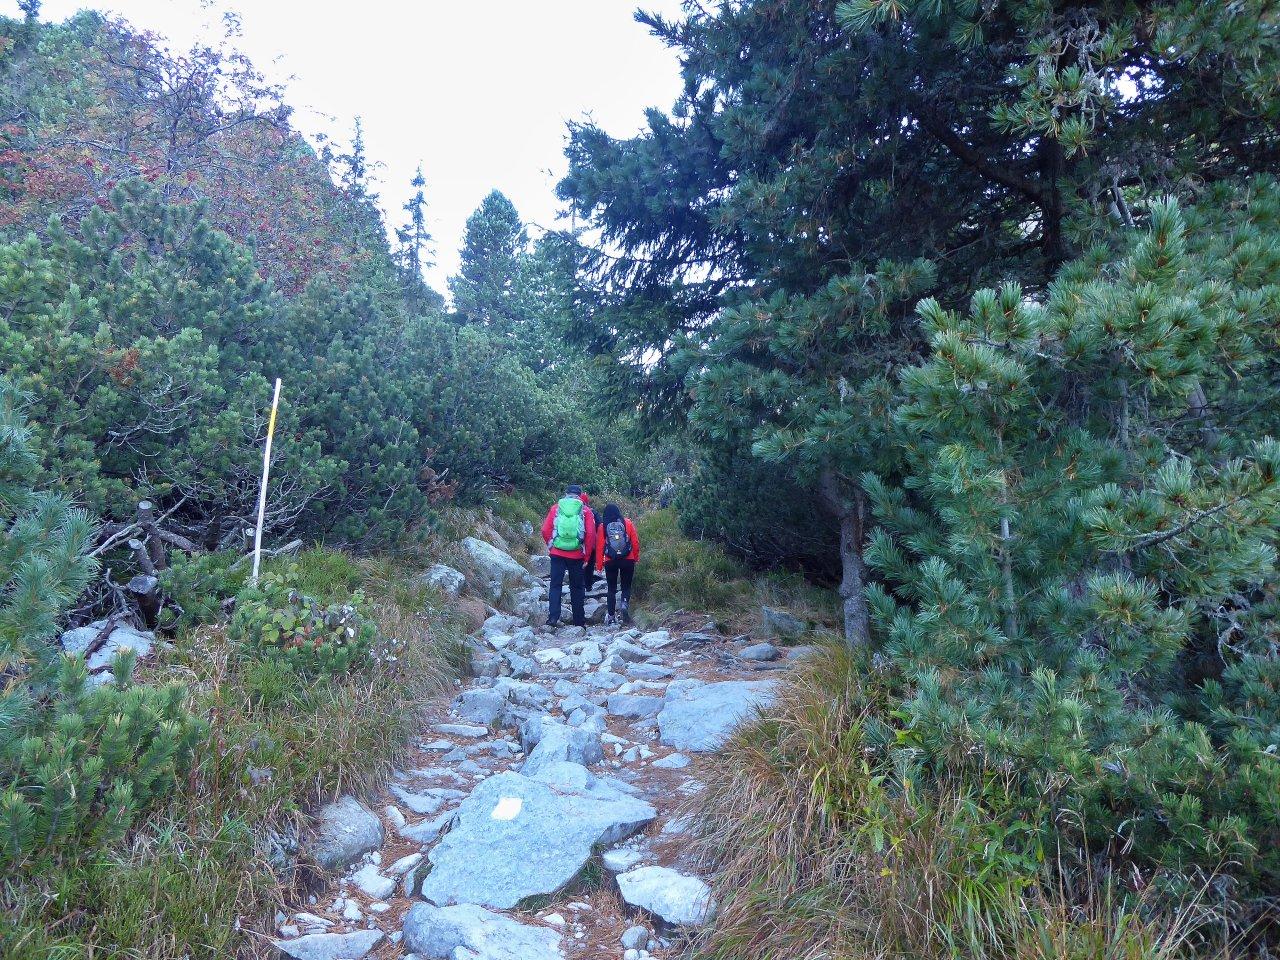 Hiking path to Skok Waterfall, Tatra Mountains, Slovakia